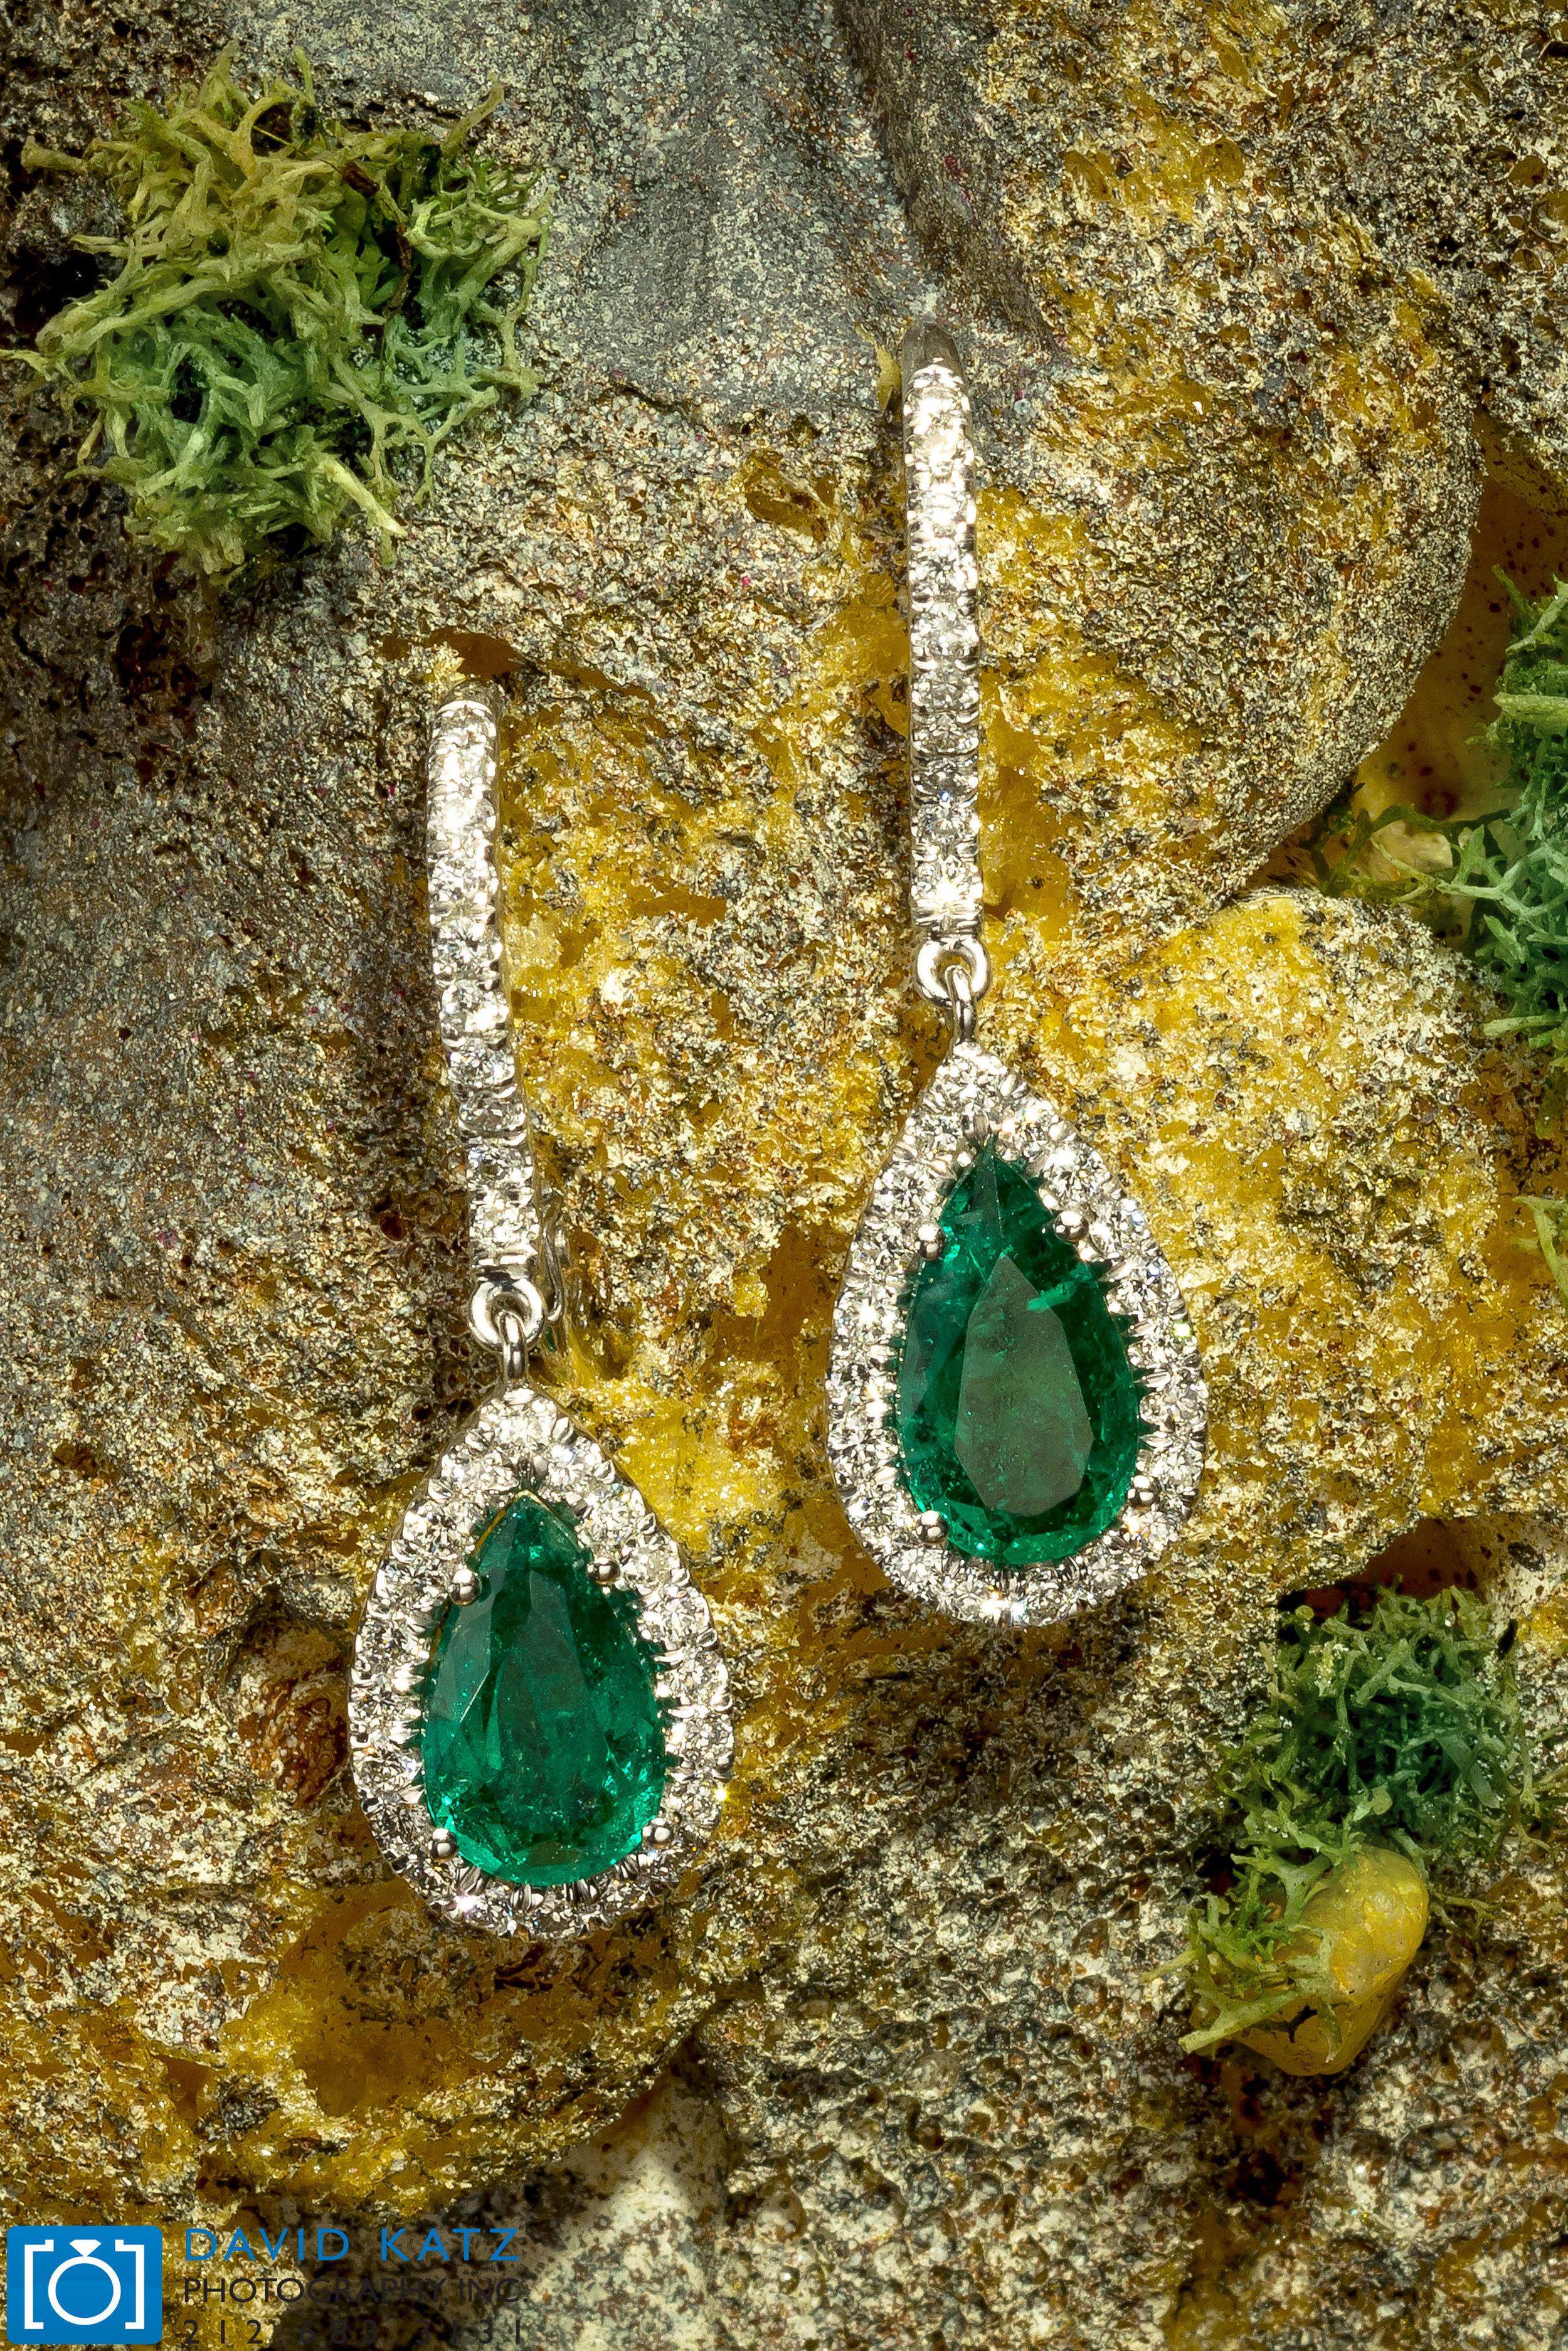 Emerald Pear Rings On the Rocks_NEWLOGO.jpg